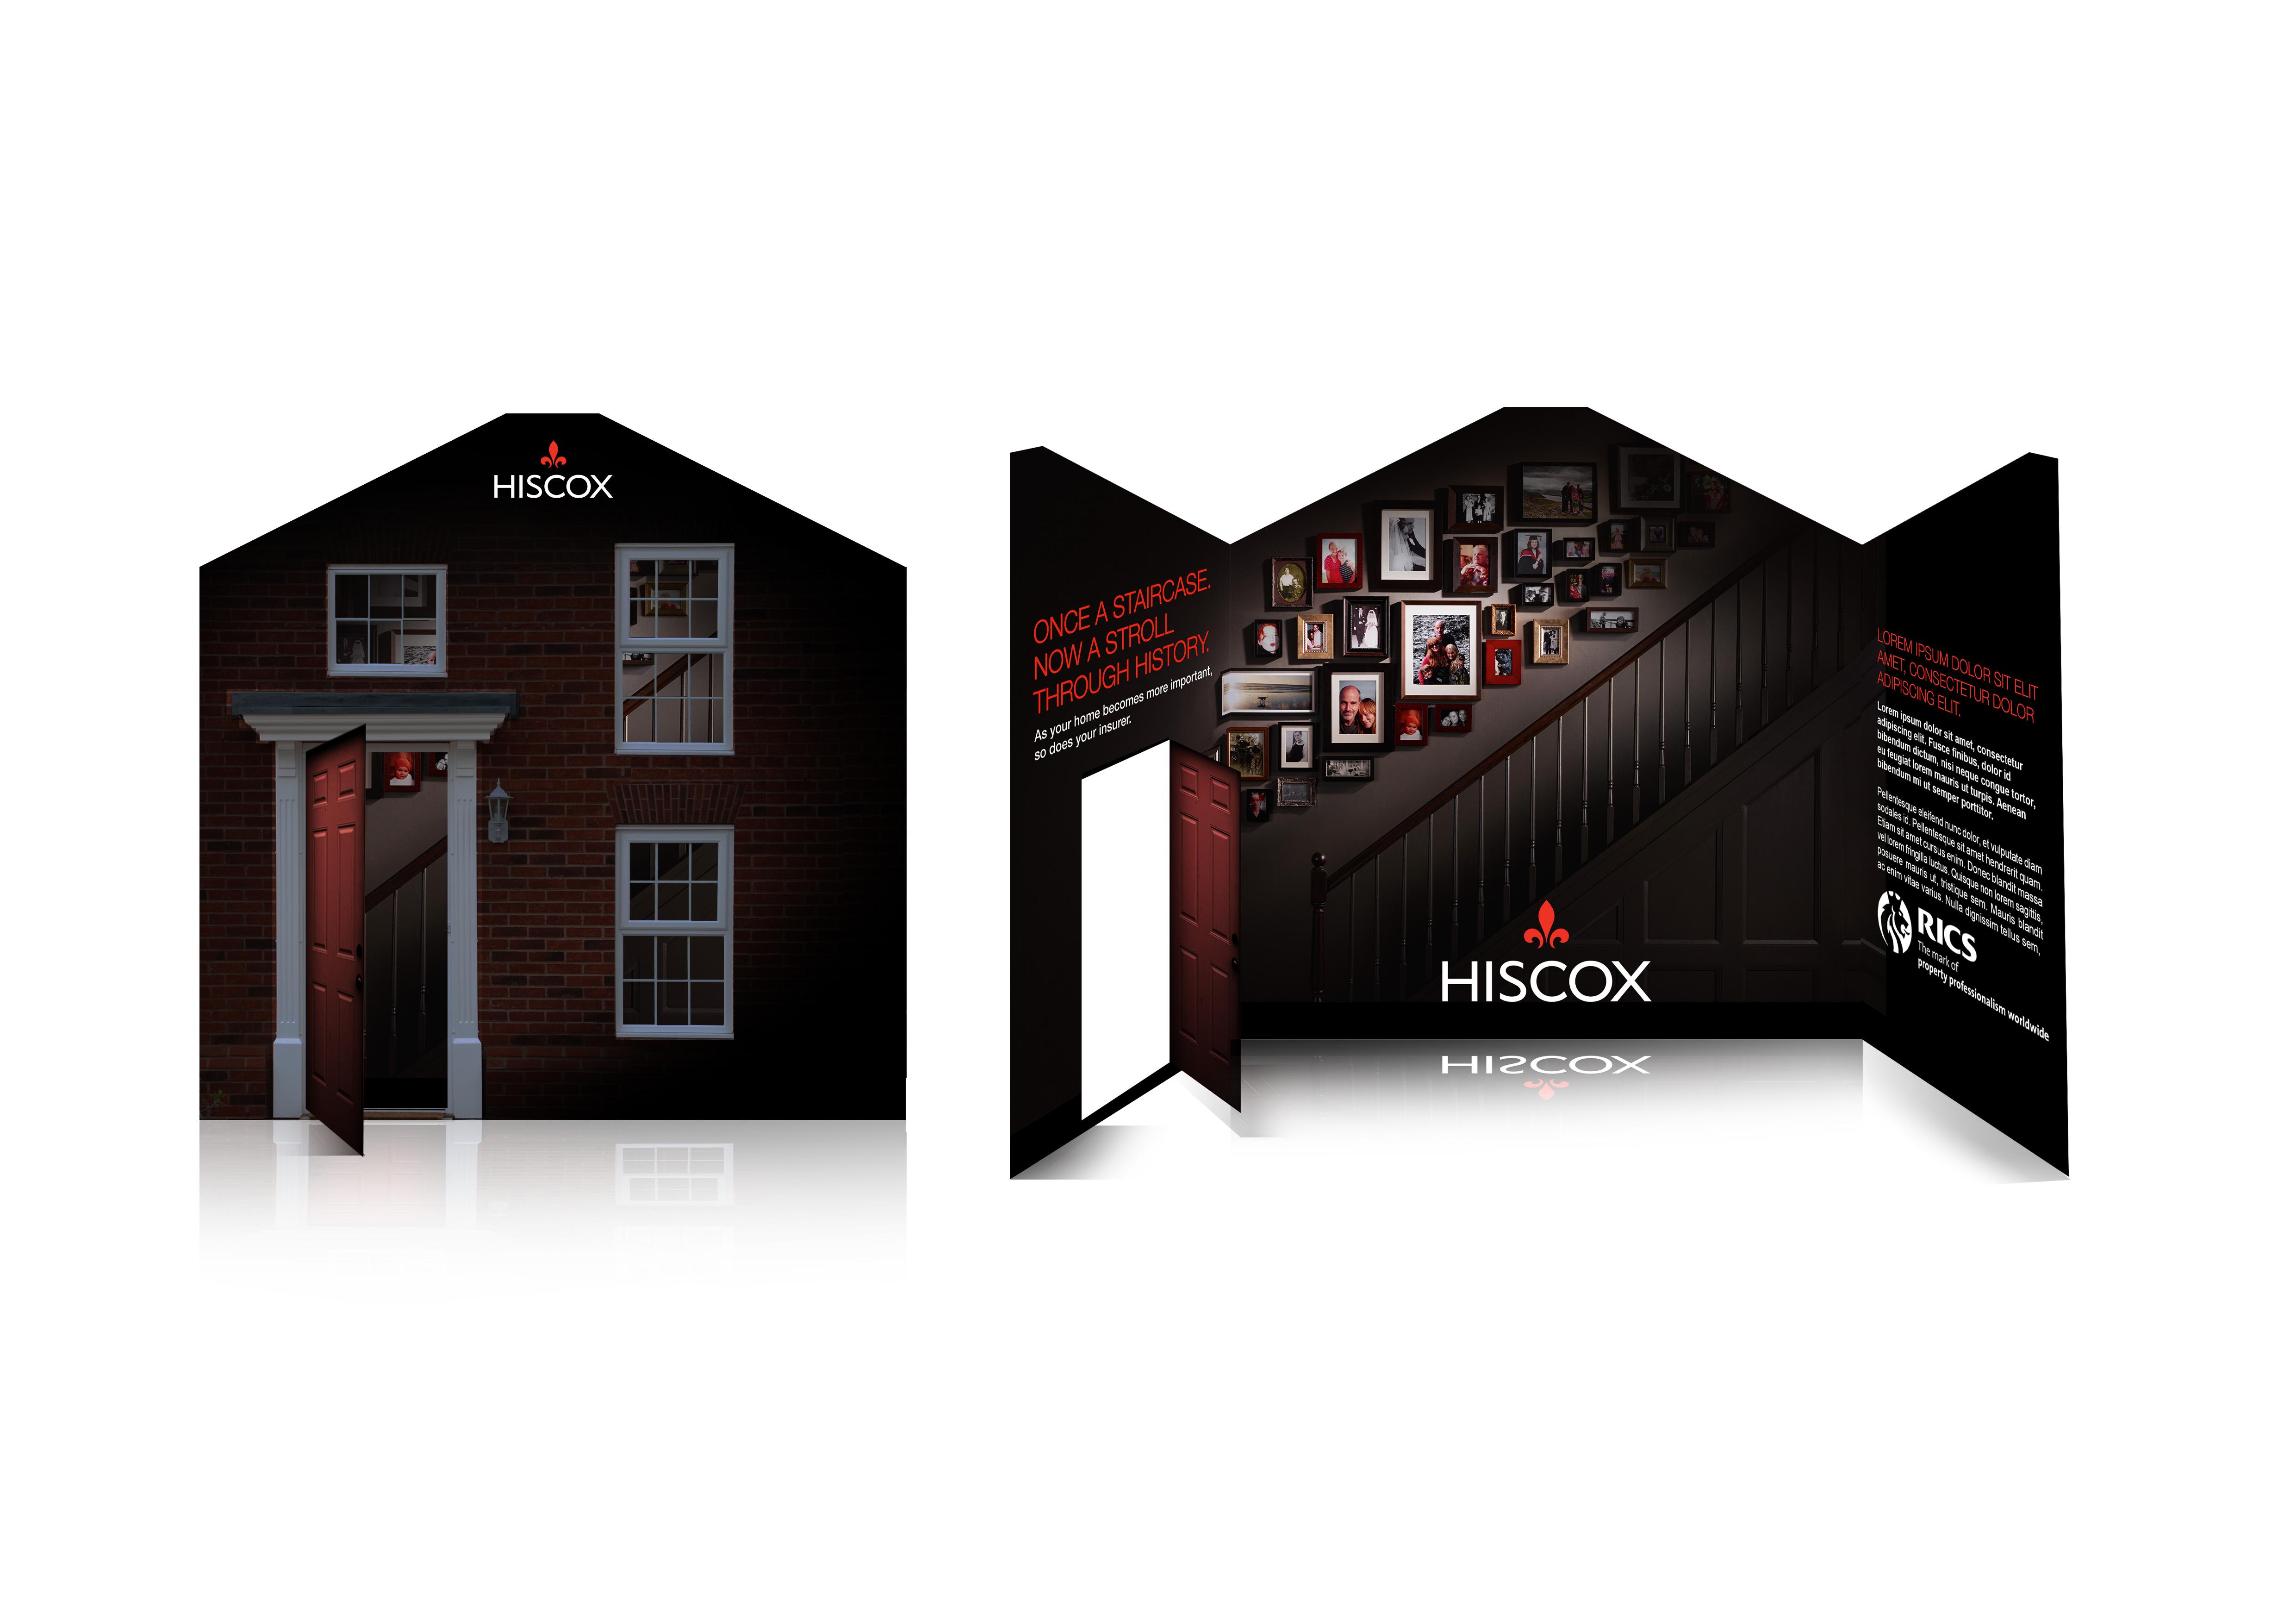 HISCOX DM2